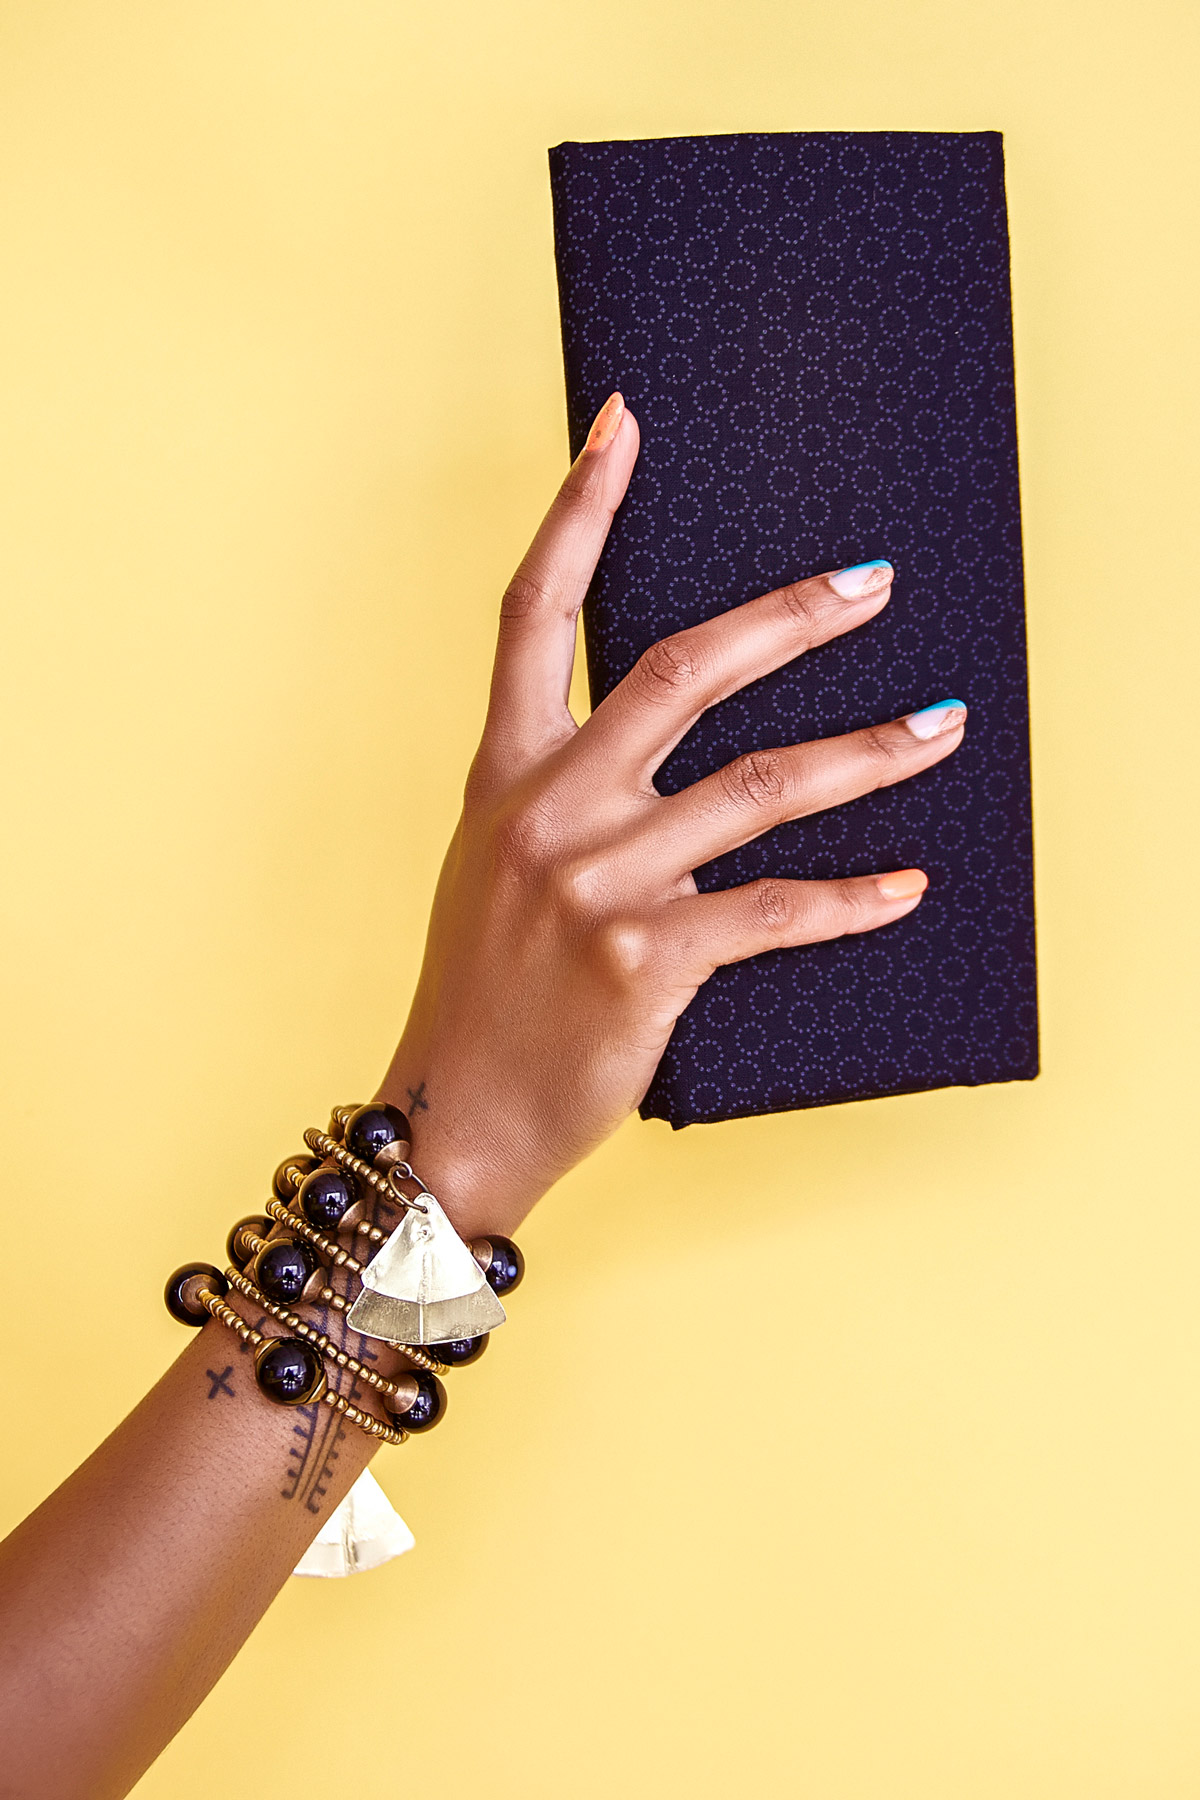 mirza-babic-fashion-photography-new-york-ny-nikon-high-fashion-product2.jpg